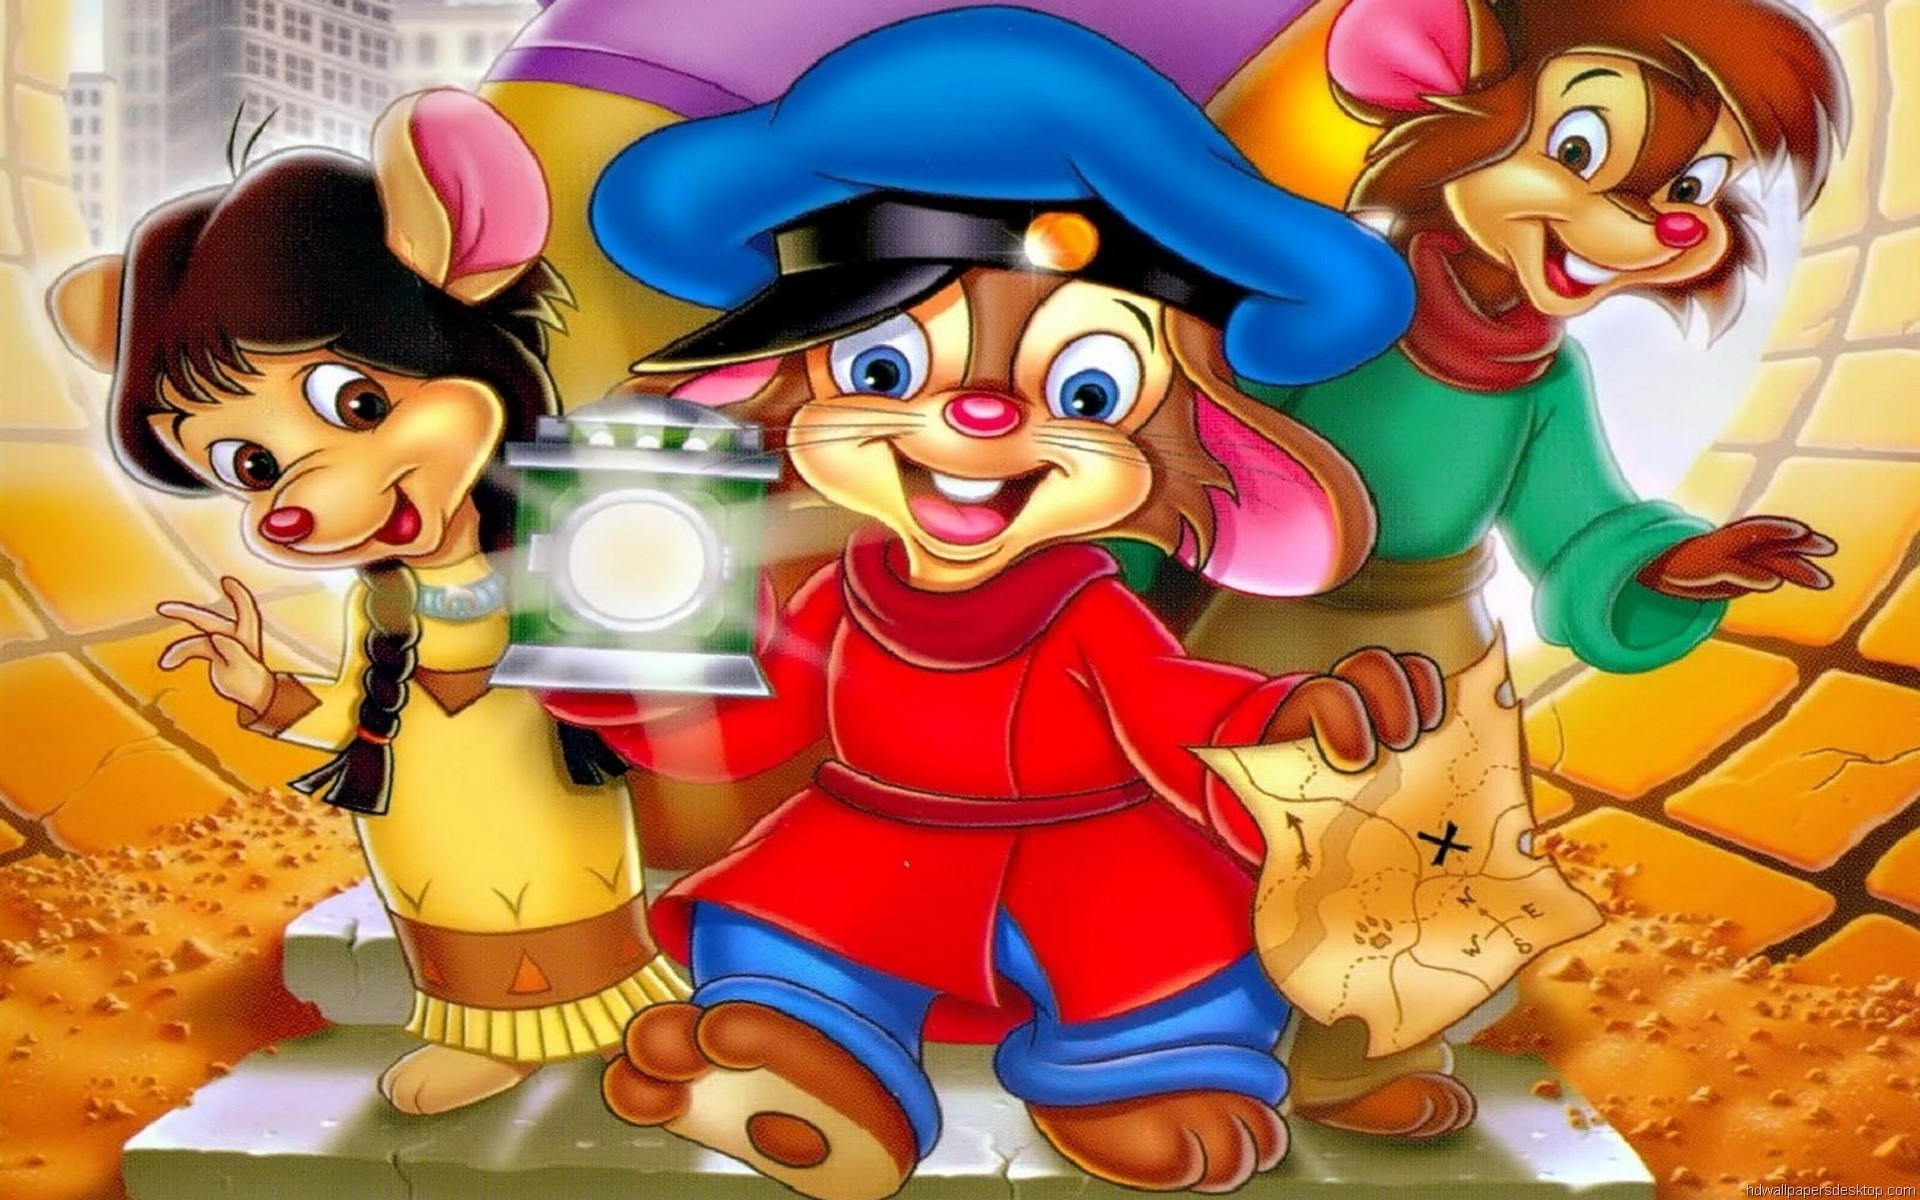 Disney character wallpaper desktop 59 images - Cartoon character wallpaper ...